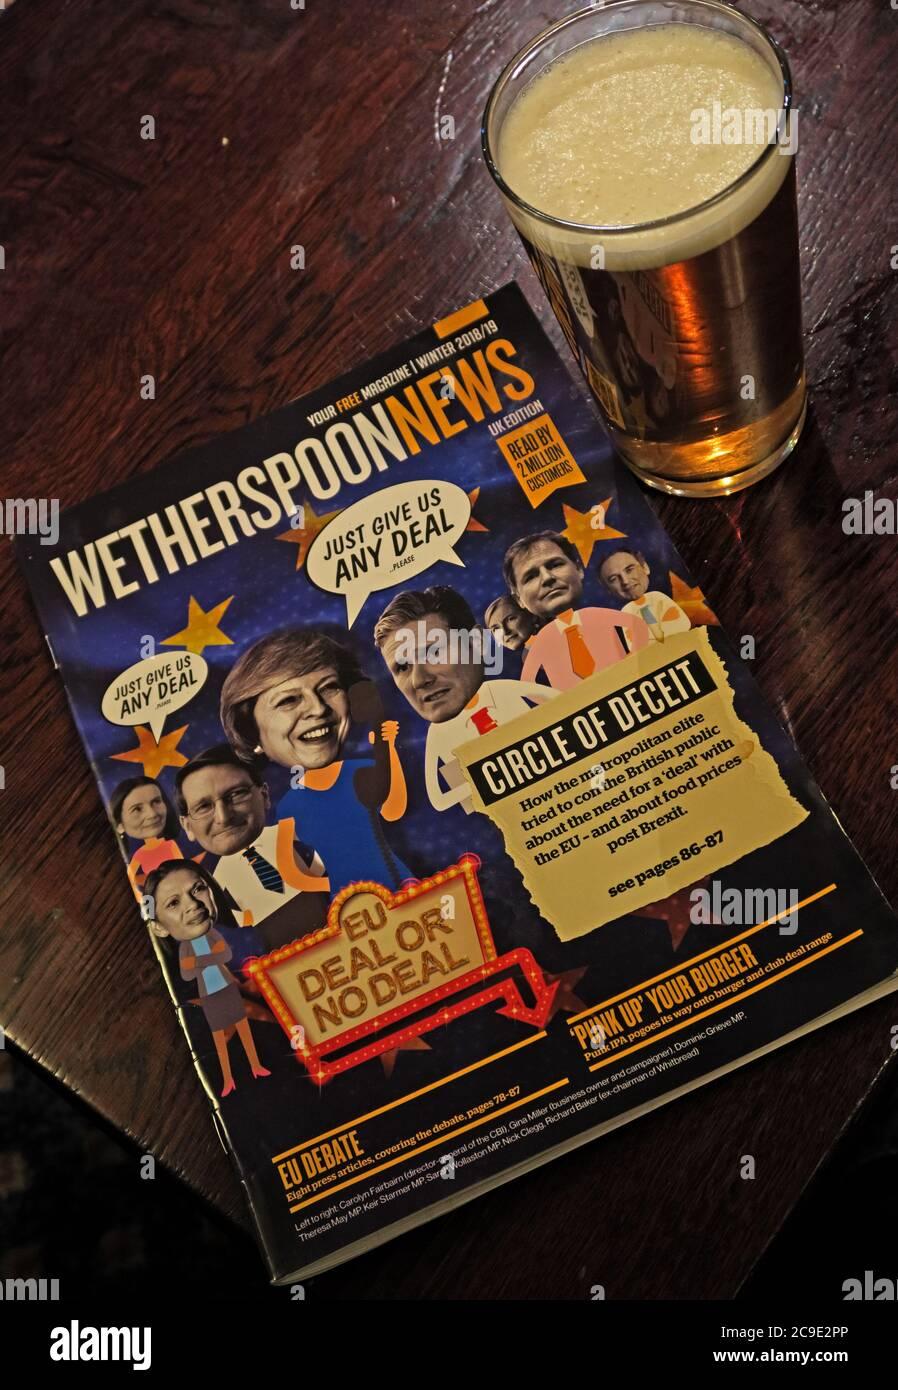 GoTonySmith,HotpixUK,@HotpixUK,England,UK,British,Great Britain,pub,bar,News,newspaper,Brexit,reading,Wetherspoon bar,Tim Martin,ale,pint,pint of bitter,pint of beer,Circle Of Deceit,EU debate,Wetherspoons,Neverspoons